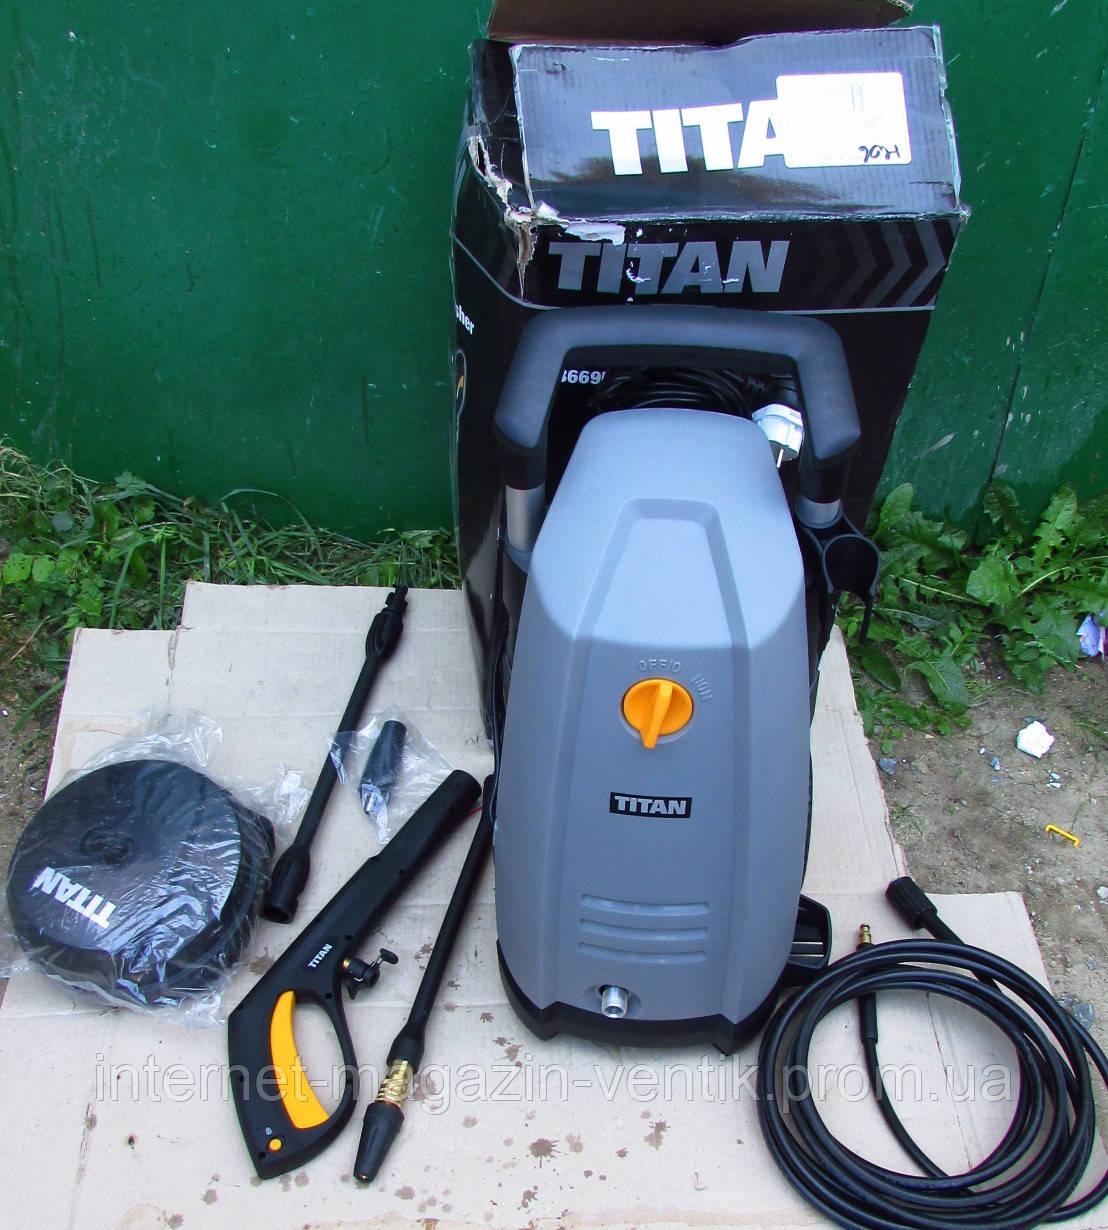 Мойка TITAN TTB669PRW 130BAR 1.8KW мойка высокого давления (Англия)